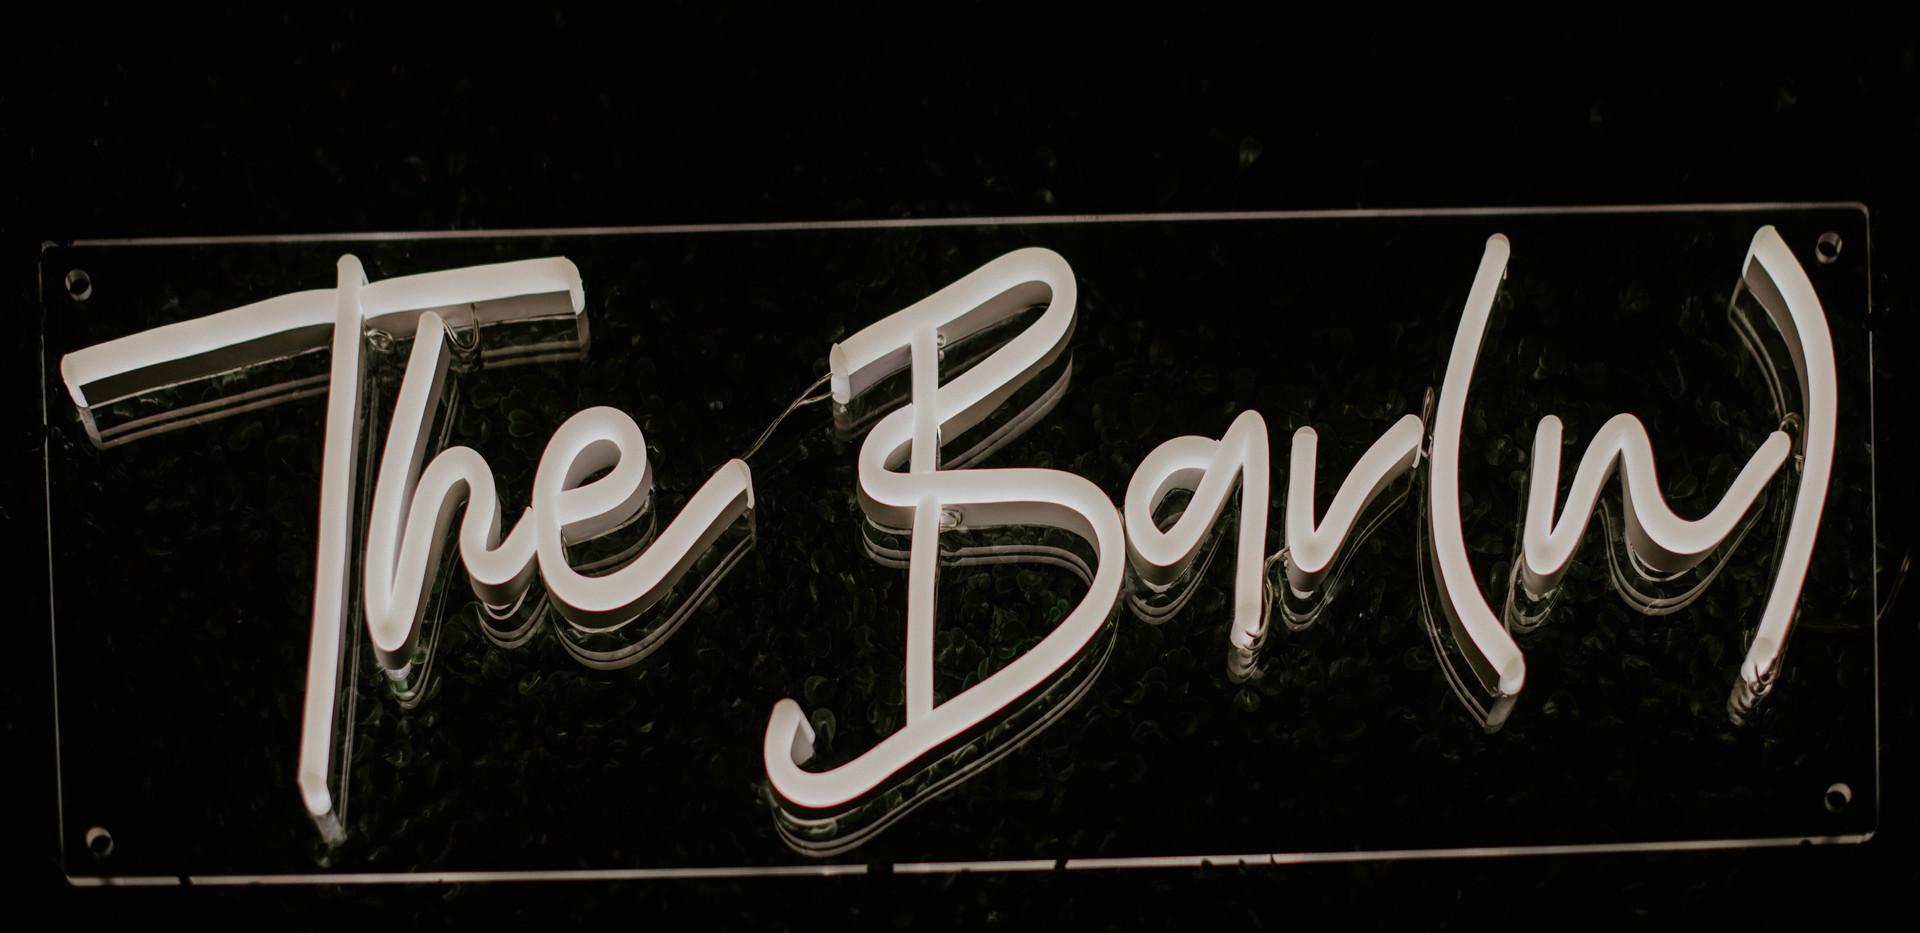 The BAR(n) Sign